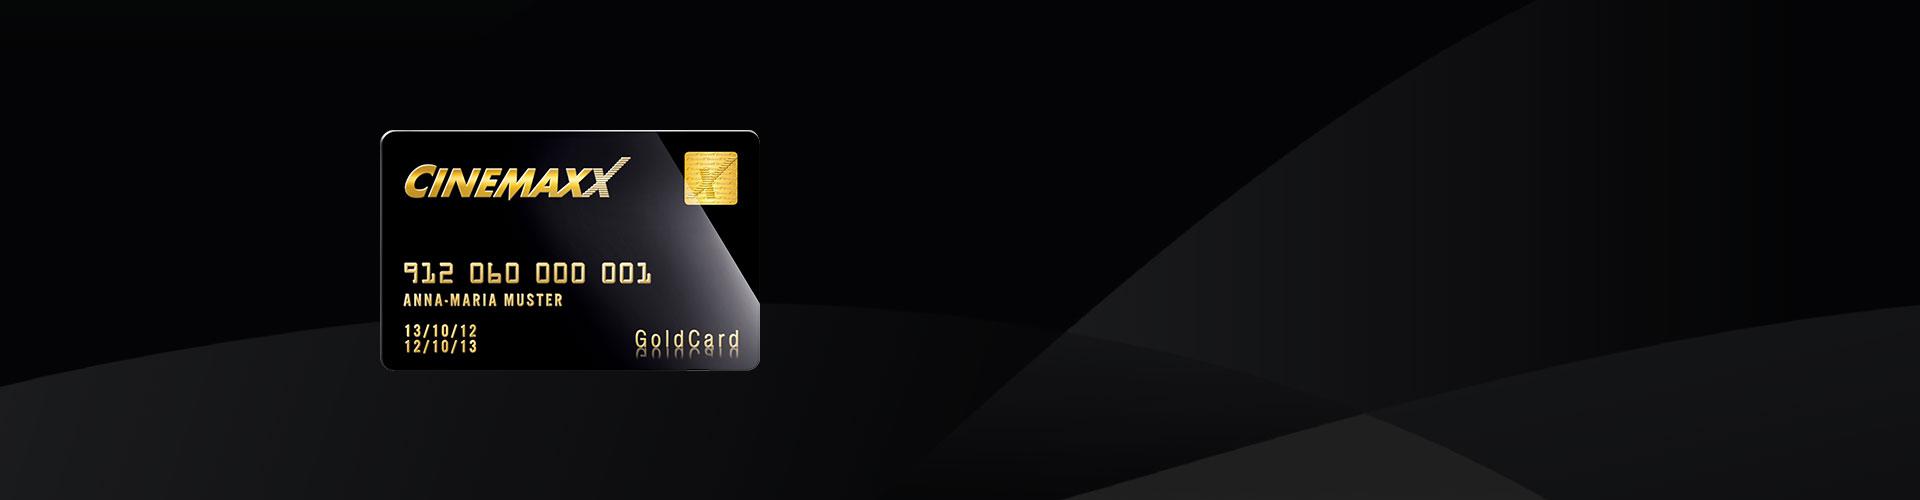 Cinemaxx Goldcard